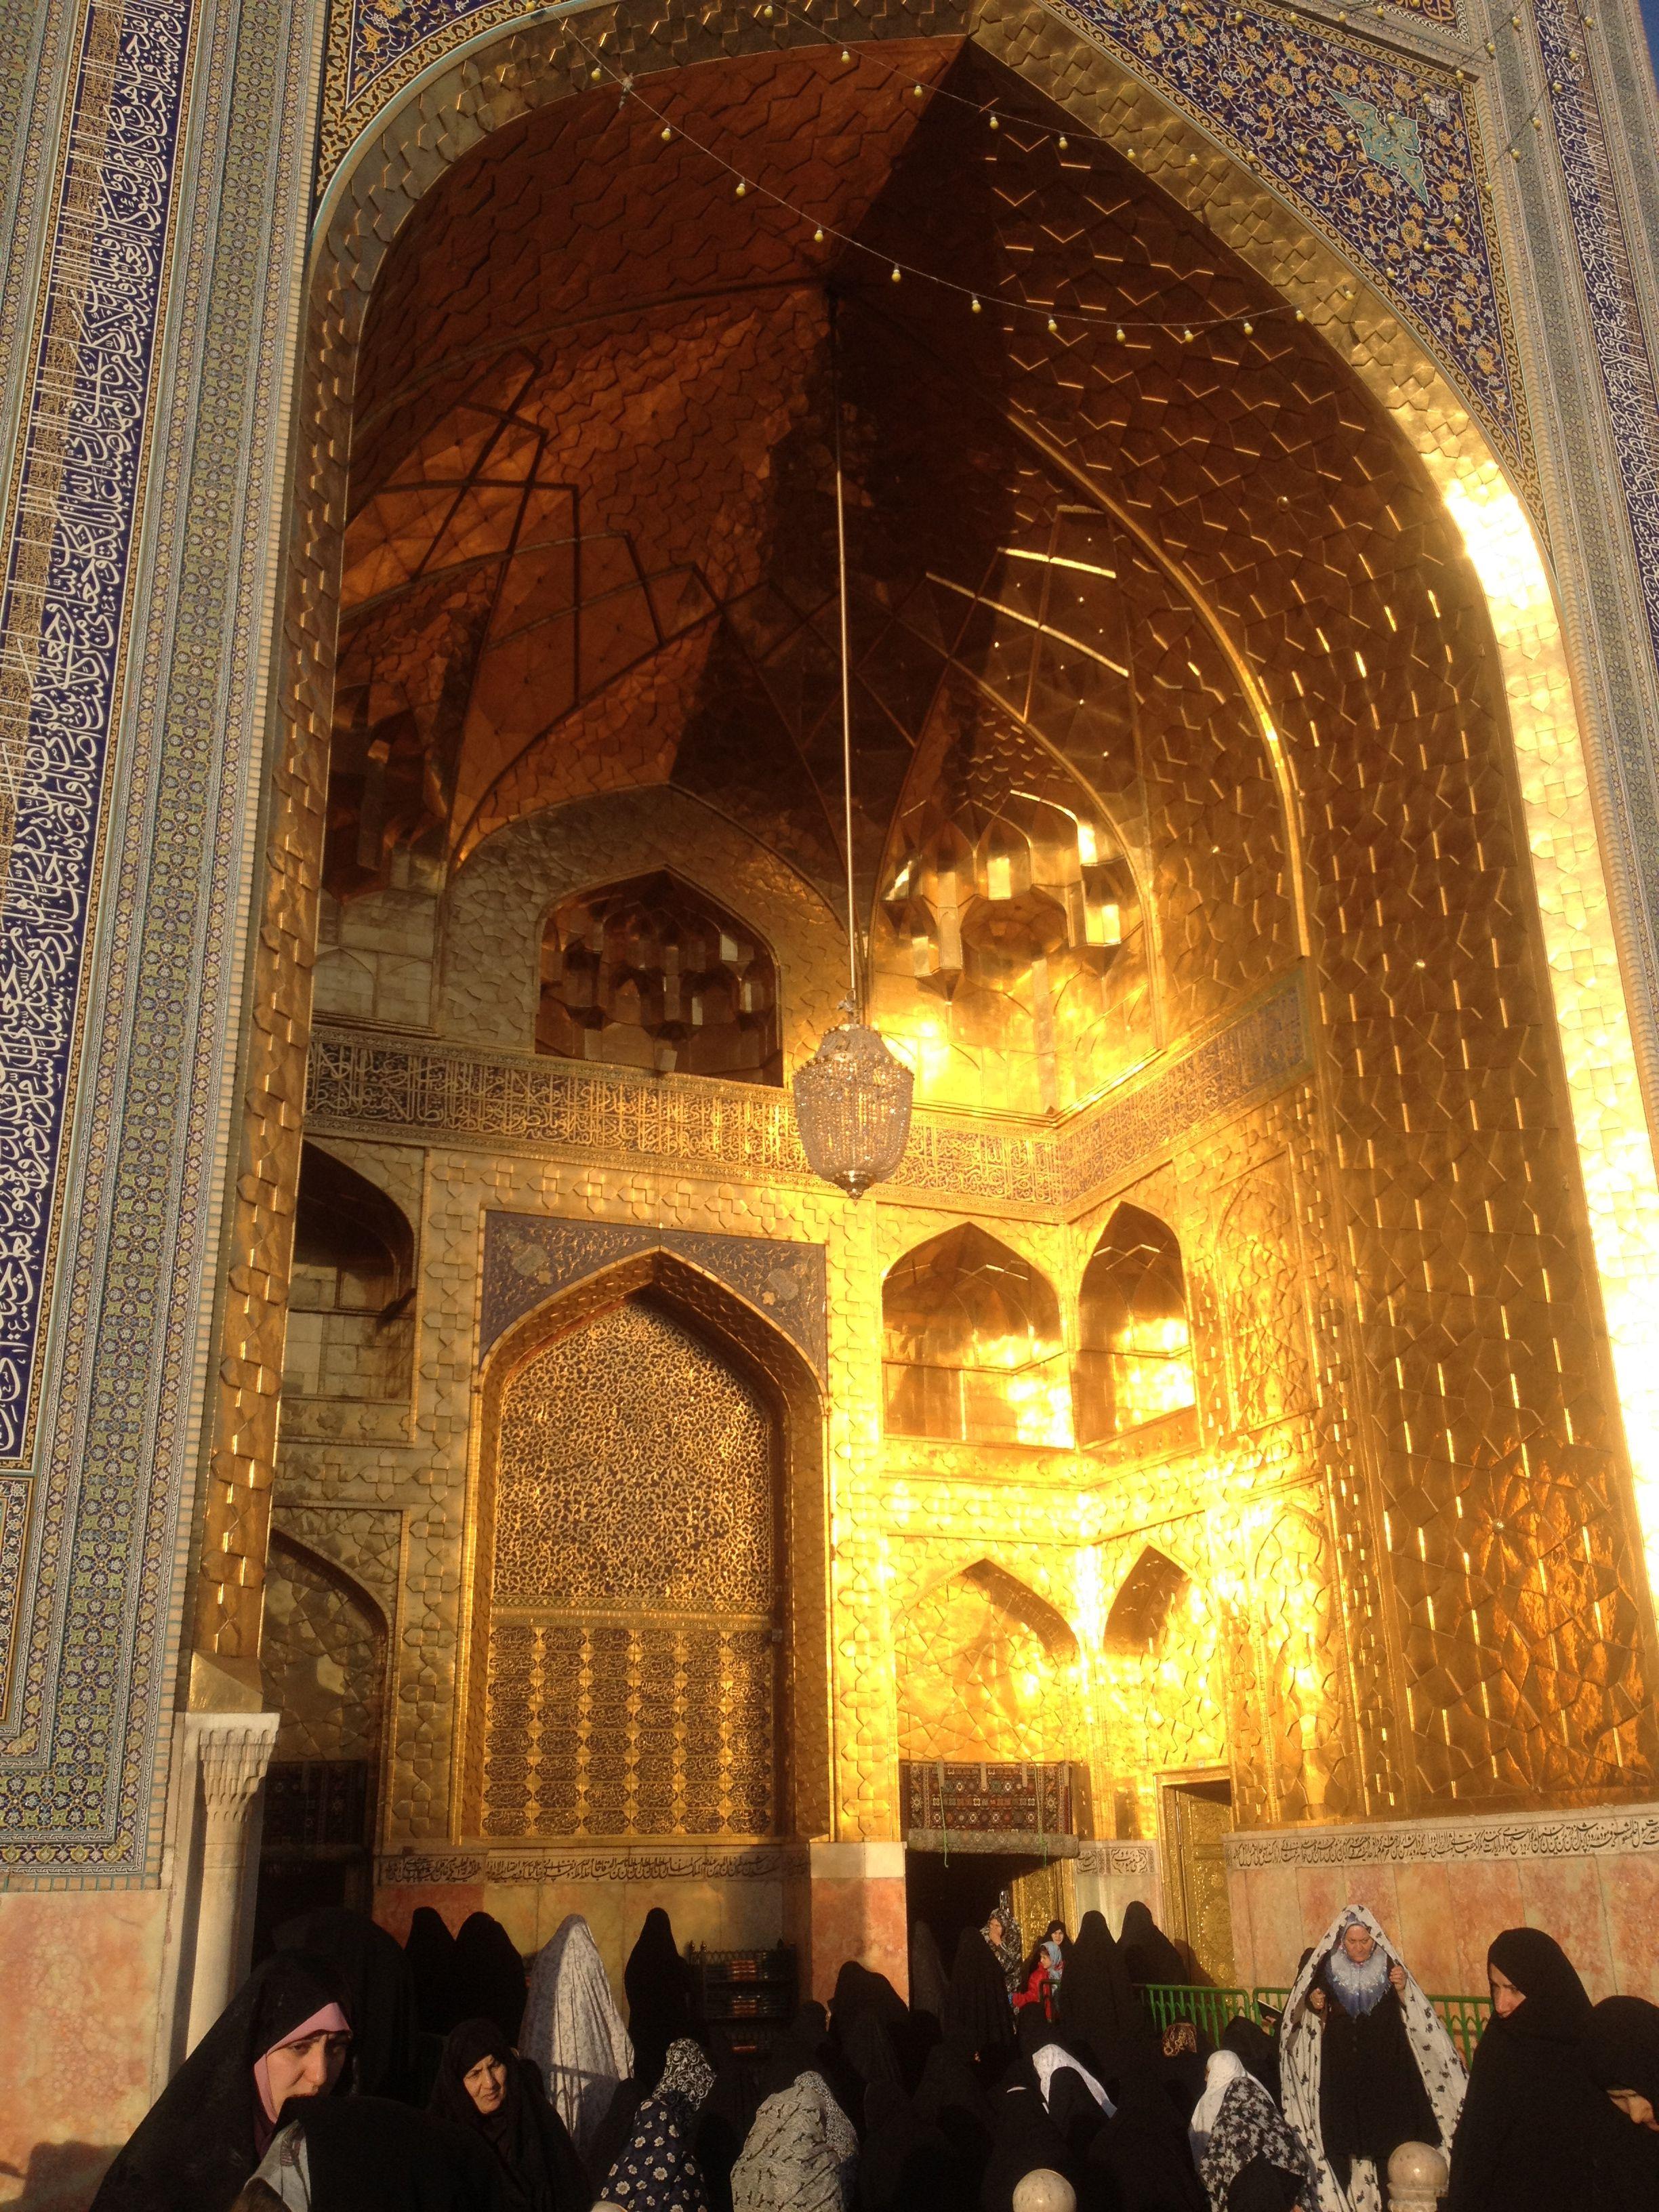 Maula Ali Shrine Wallpaper: The Entrance To The Shrine Of Imam Ali Raza (a.s.w.s.) In